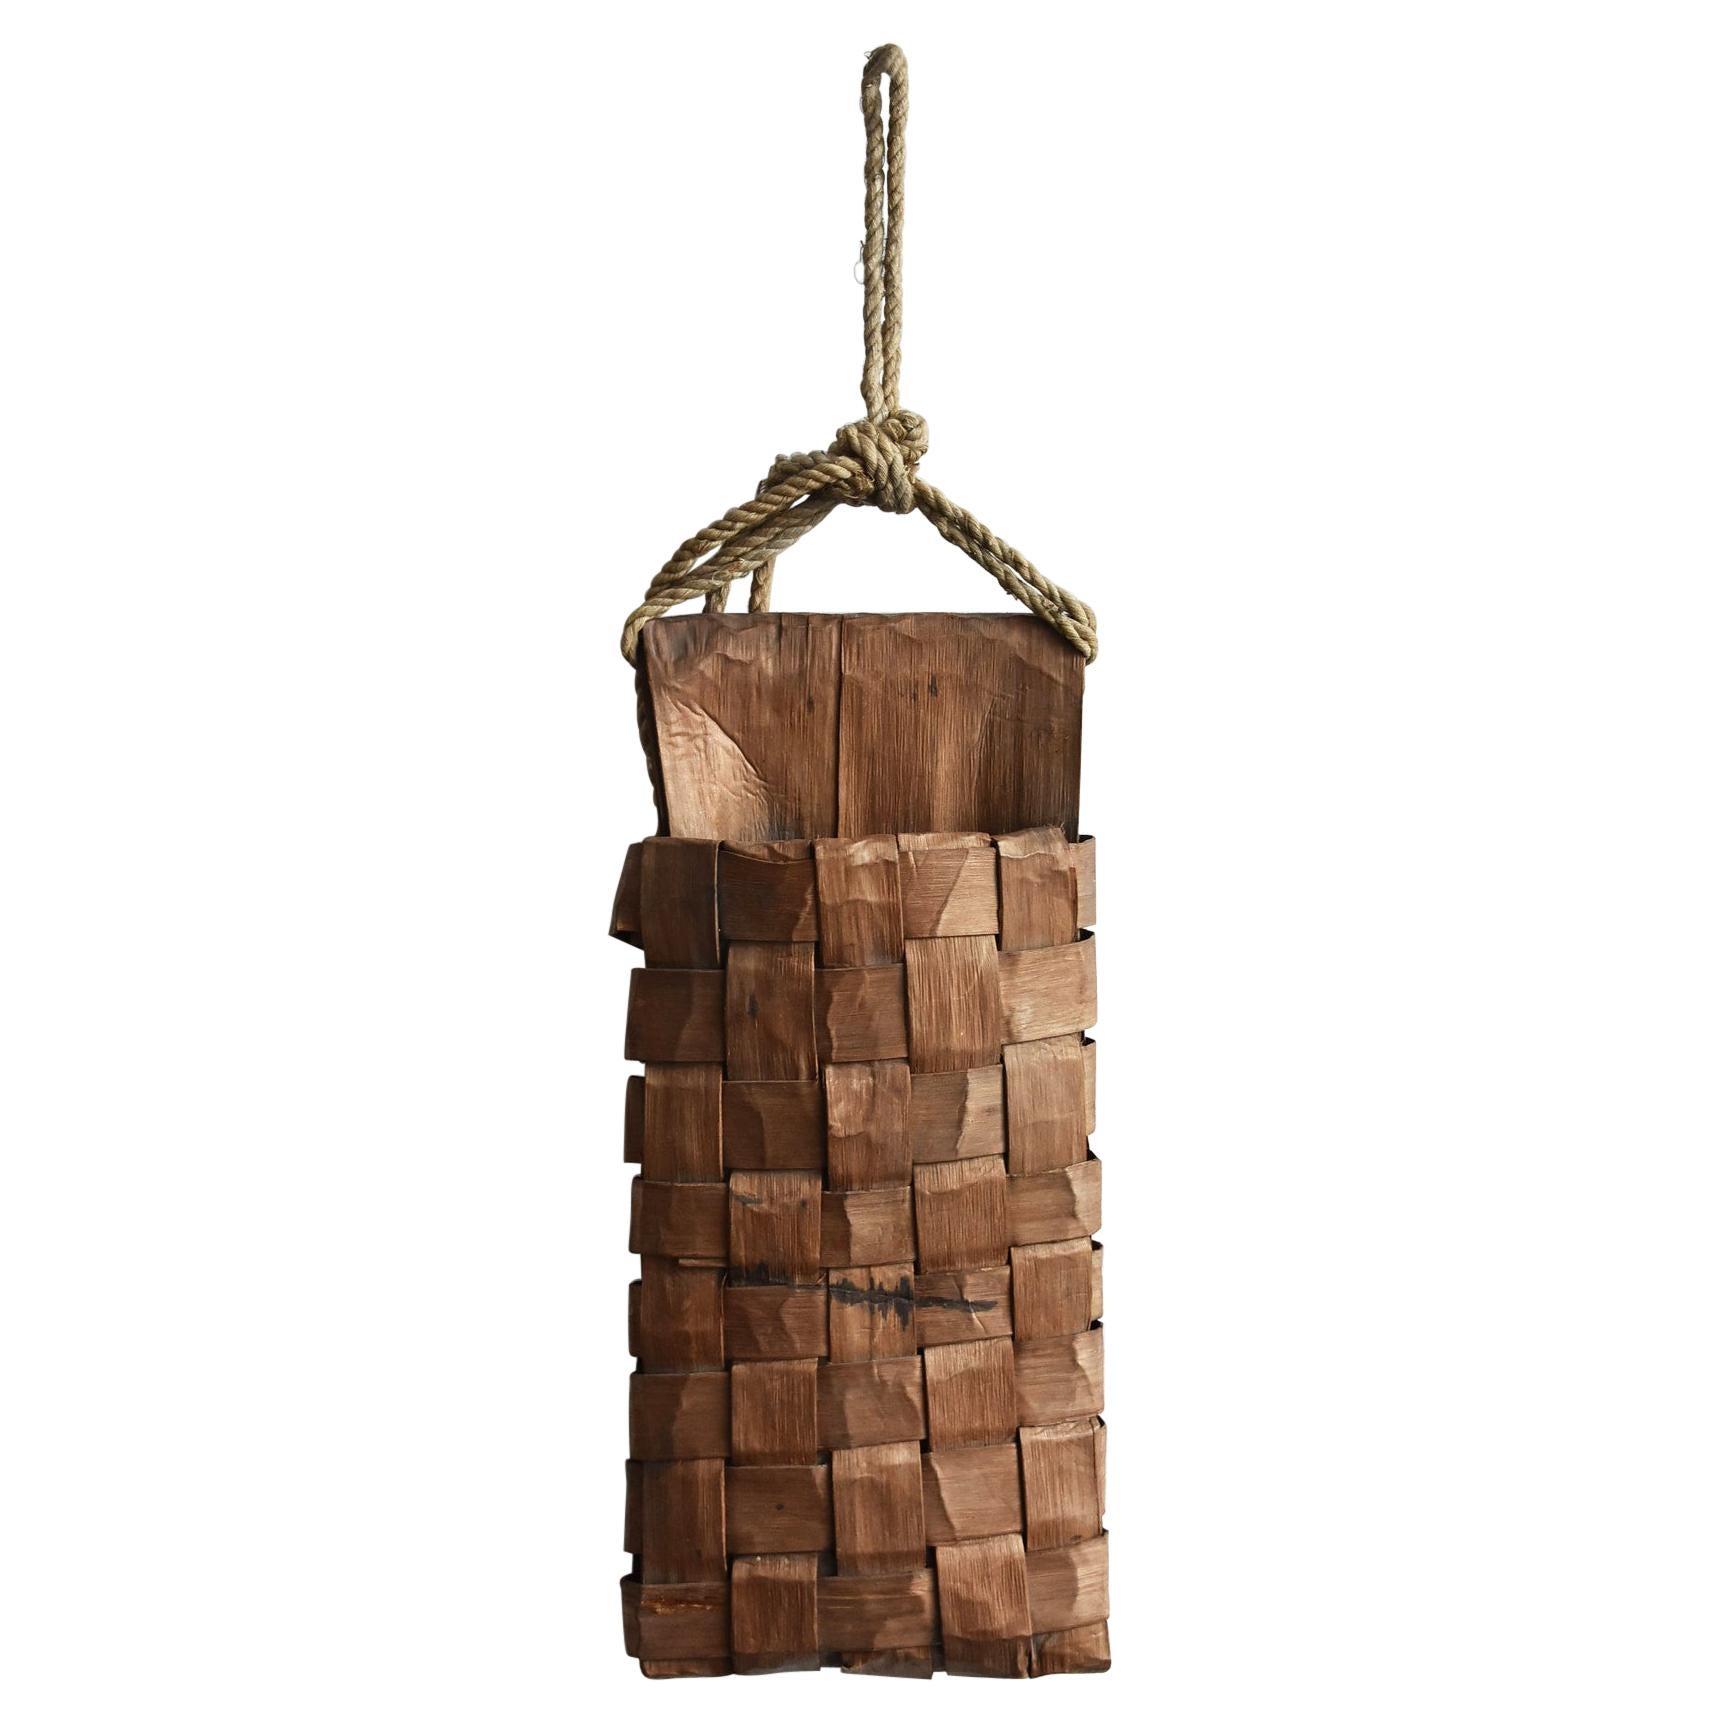 Old Japanese Folk Art / Farmer's Tools Made of Bark / Wall Hangings Vase